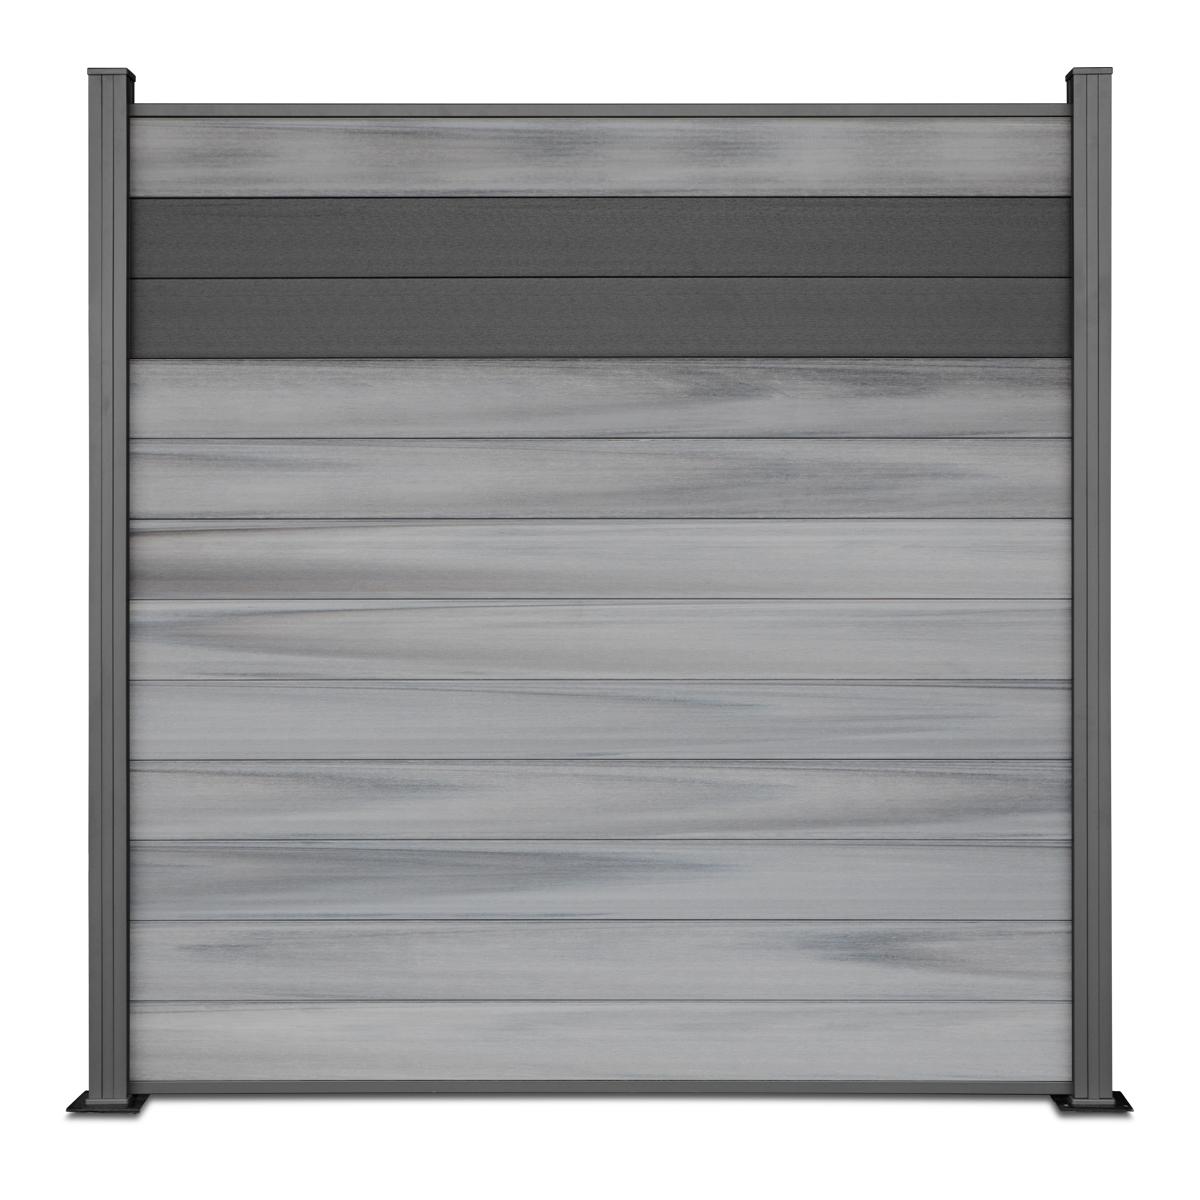 TOMI WPC COEX Premium Line BiColor Zaun Sichtschutzzaun Grau Anthrazit